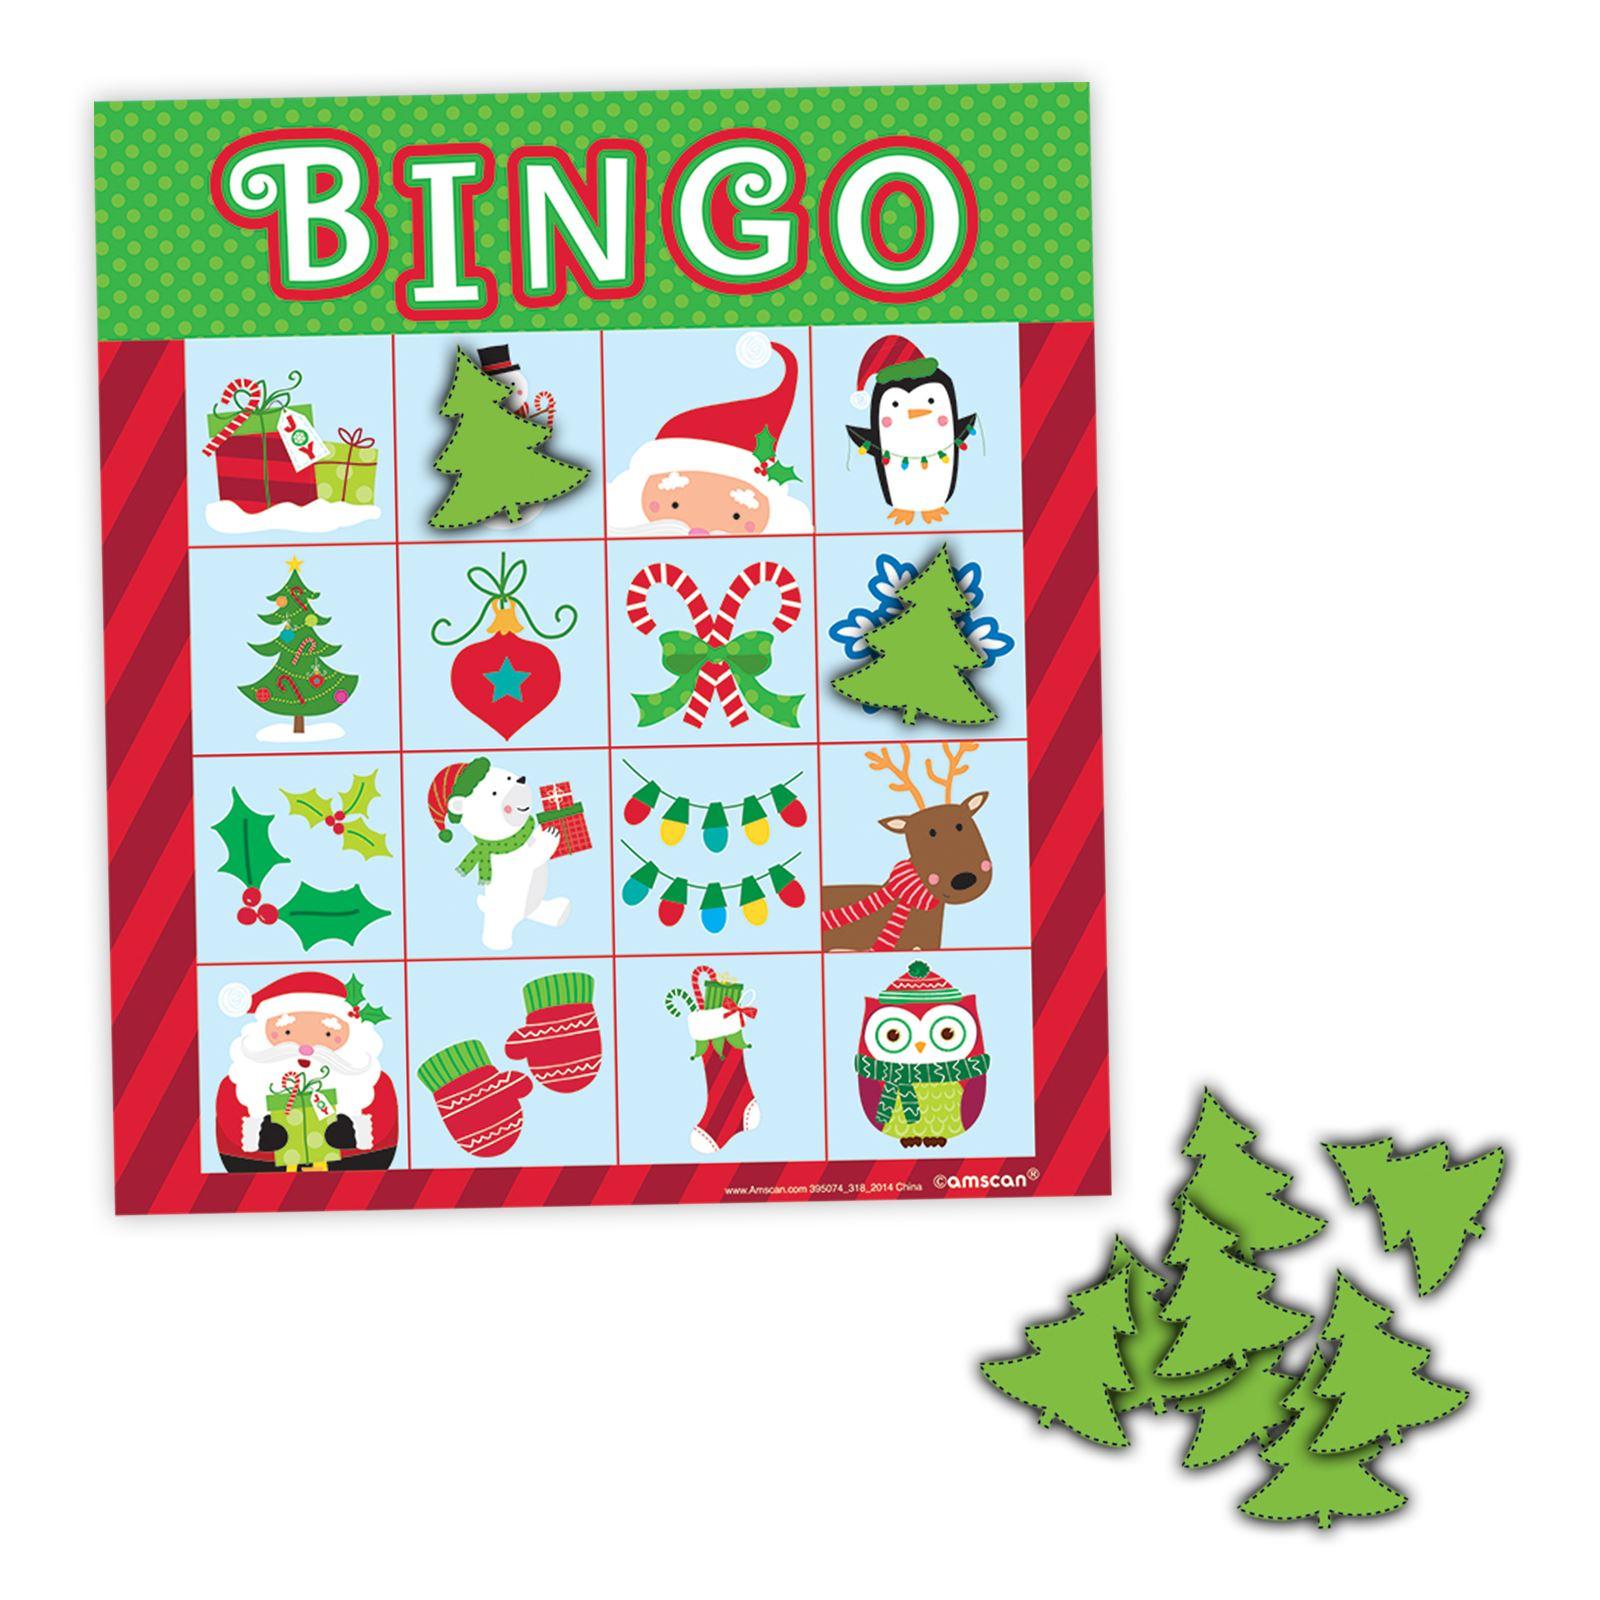 weihnachten bingo karte party spiel kinder familie 16. Black Bedroom Furniture Sets. Home Design Ideas